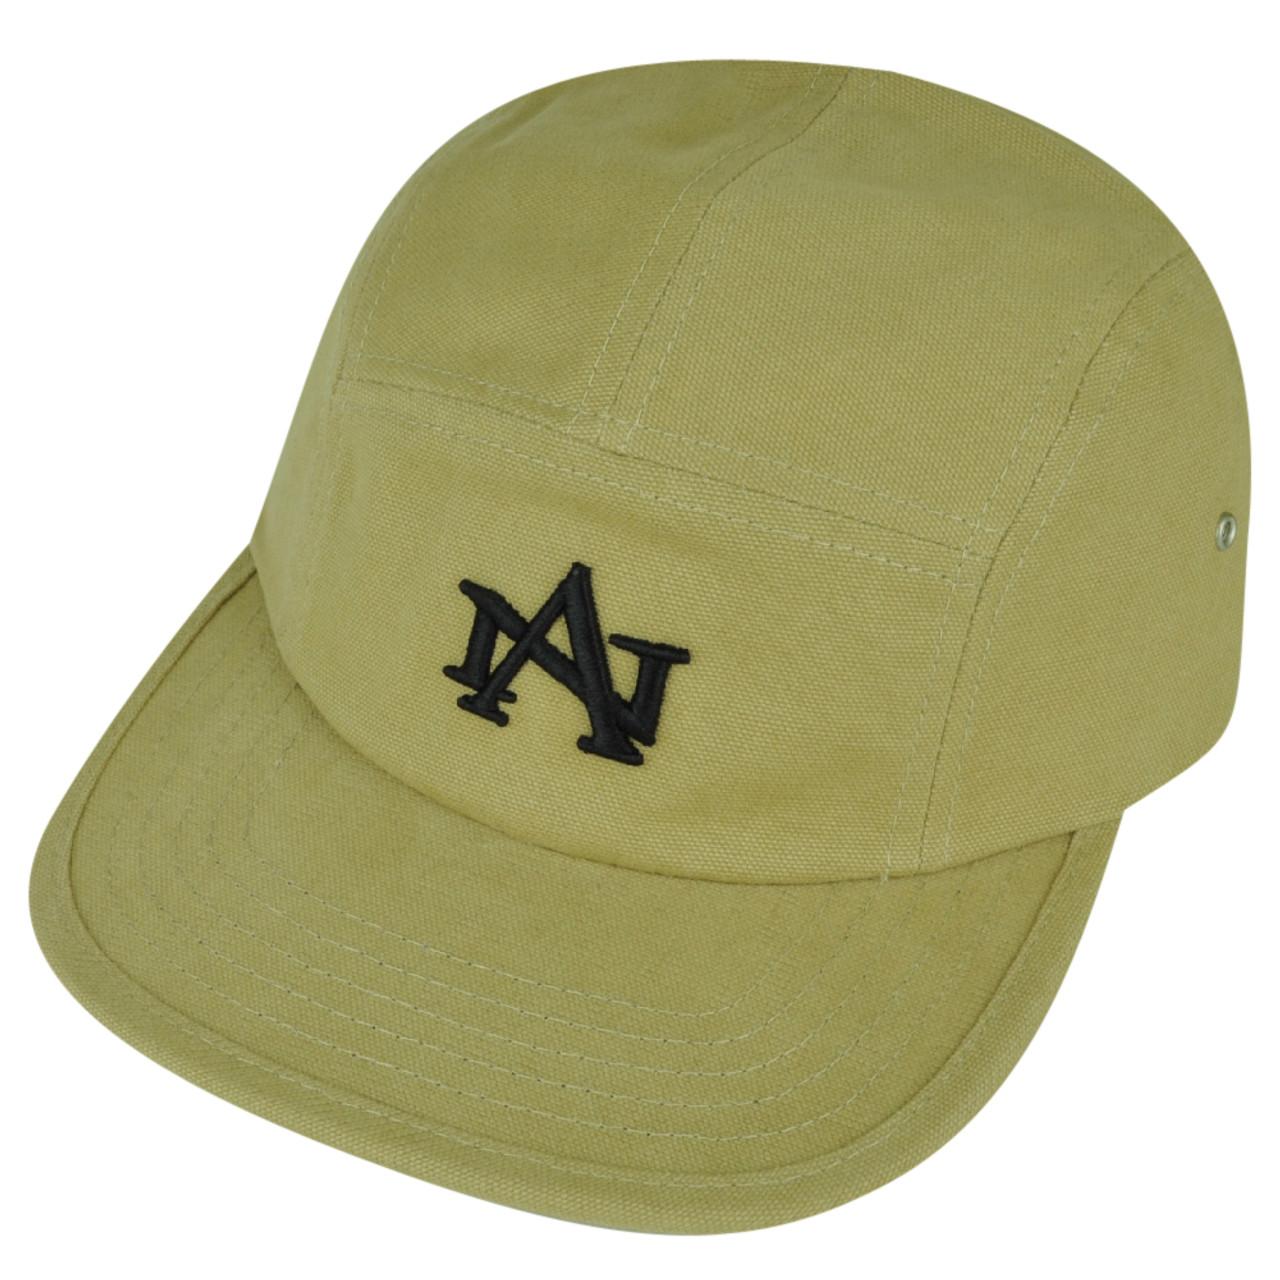 00f5dcdc American Needle Logo Clip Buckle Hat Cap Khaki Relaxed Brand Flat Bill  Adjustable - Cap Store Online.com